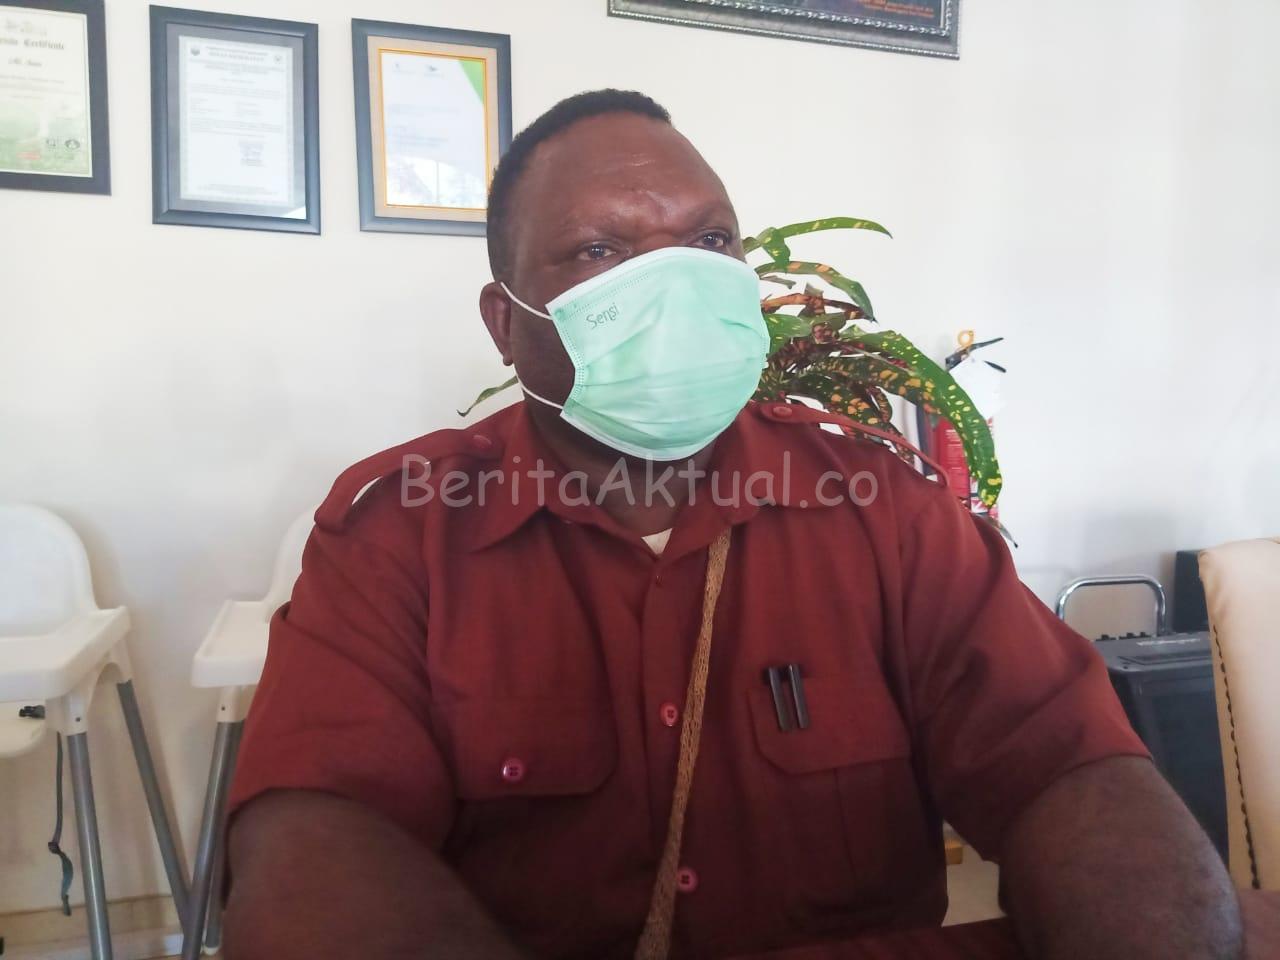 DPR Papua Barat Bentuk Pansus Awasi Dana Covid 197.8 Miliar 26 IMG 20200624 WA0036